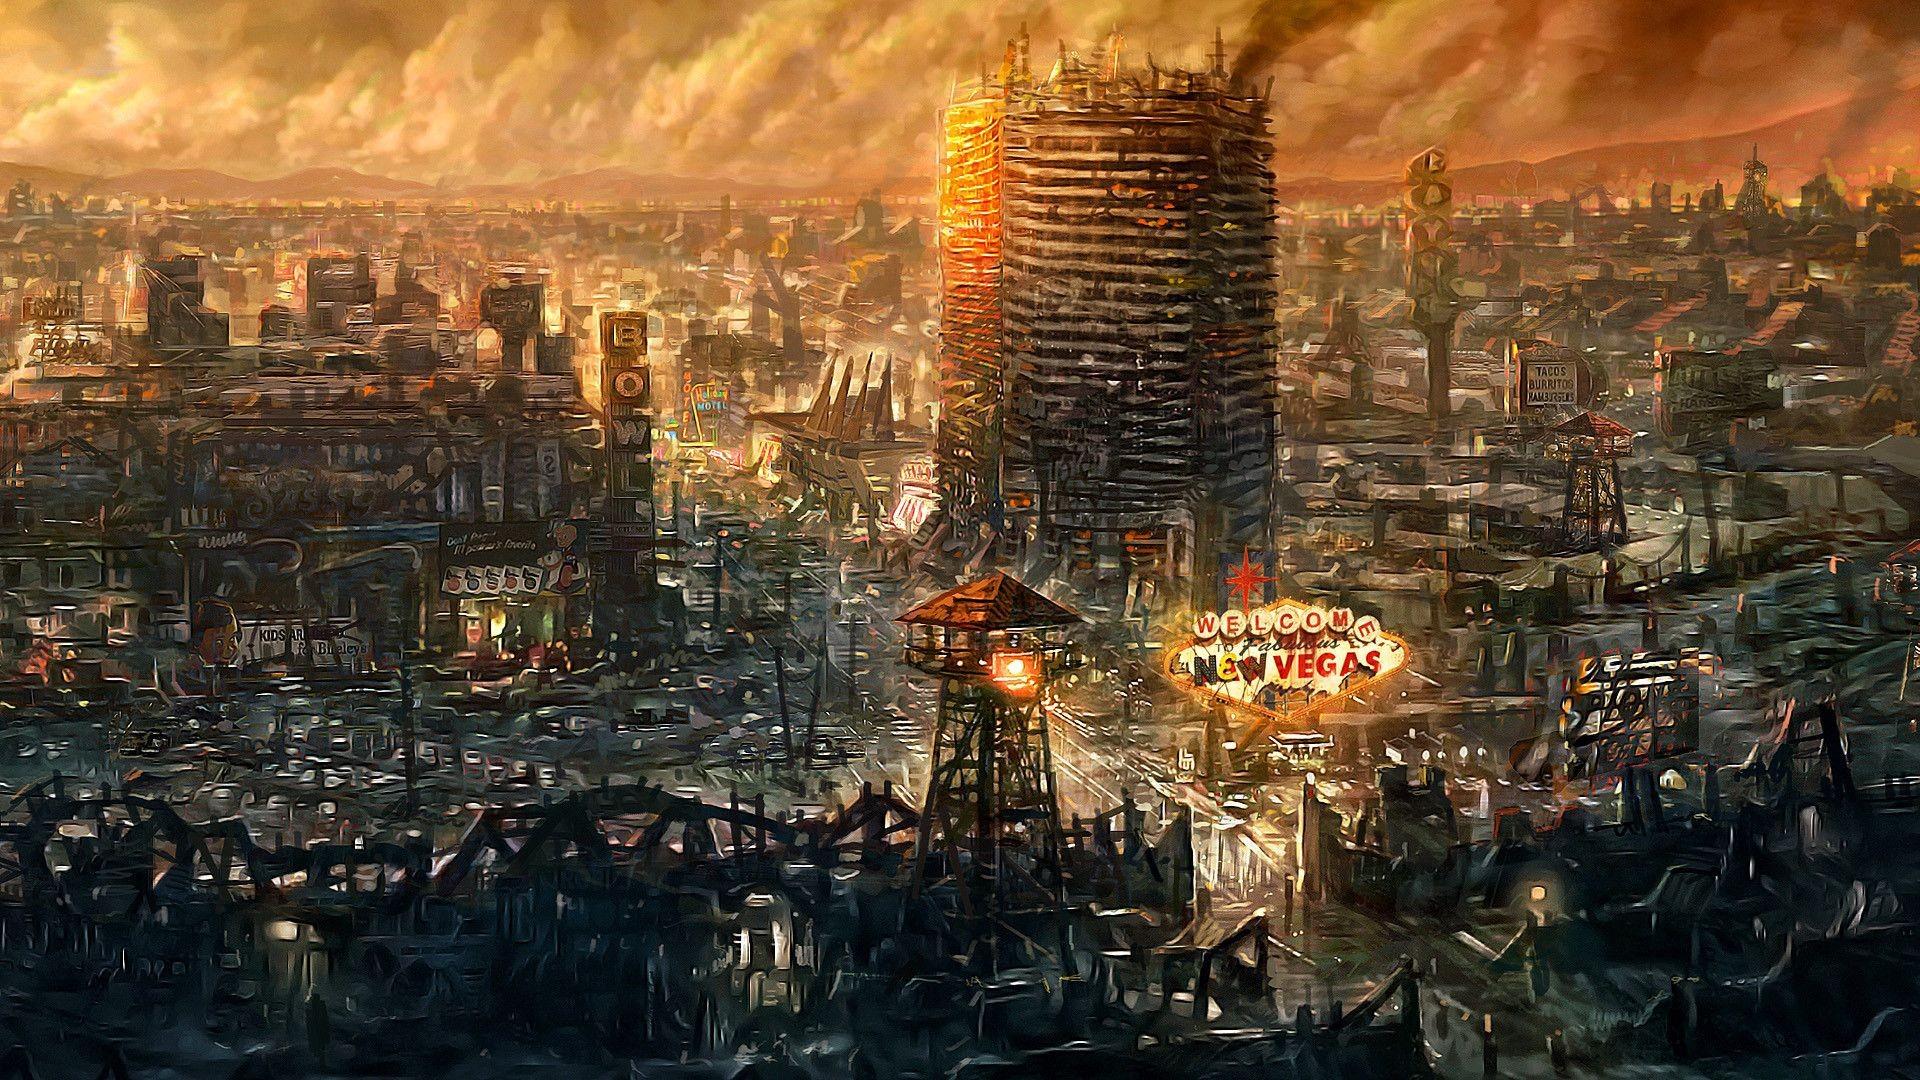 Fallout 4 wallpaper 1080p Download free cool full HD